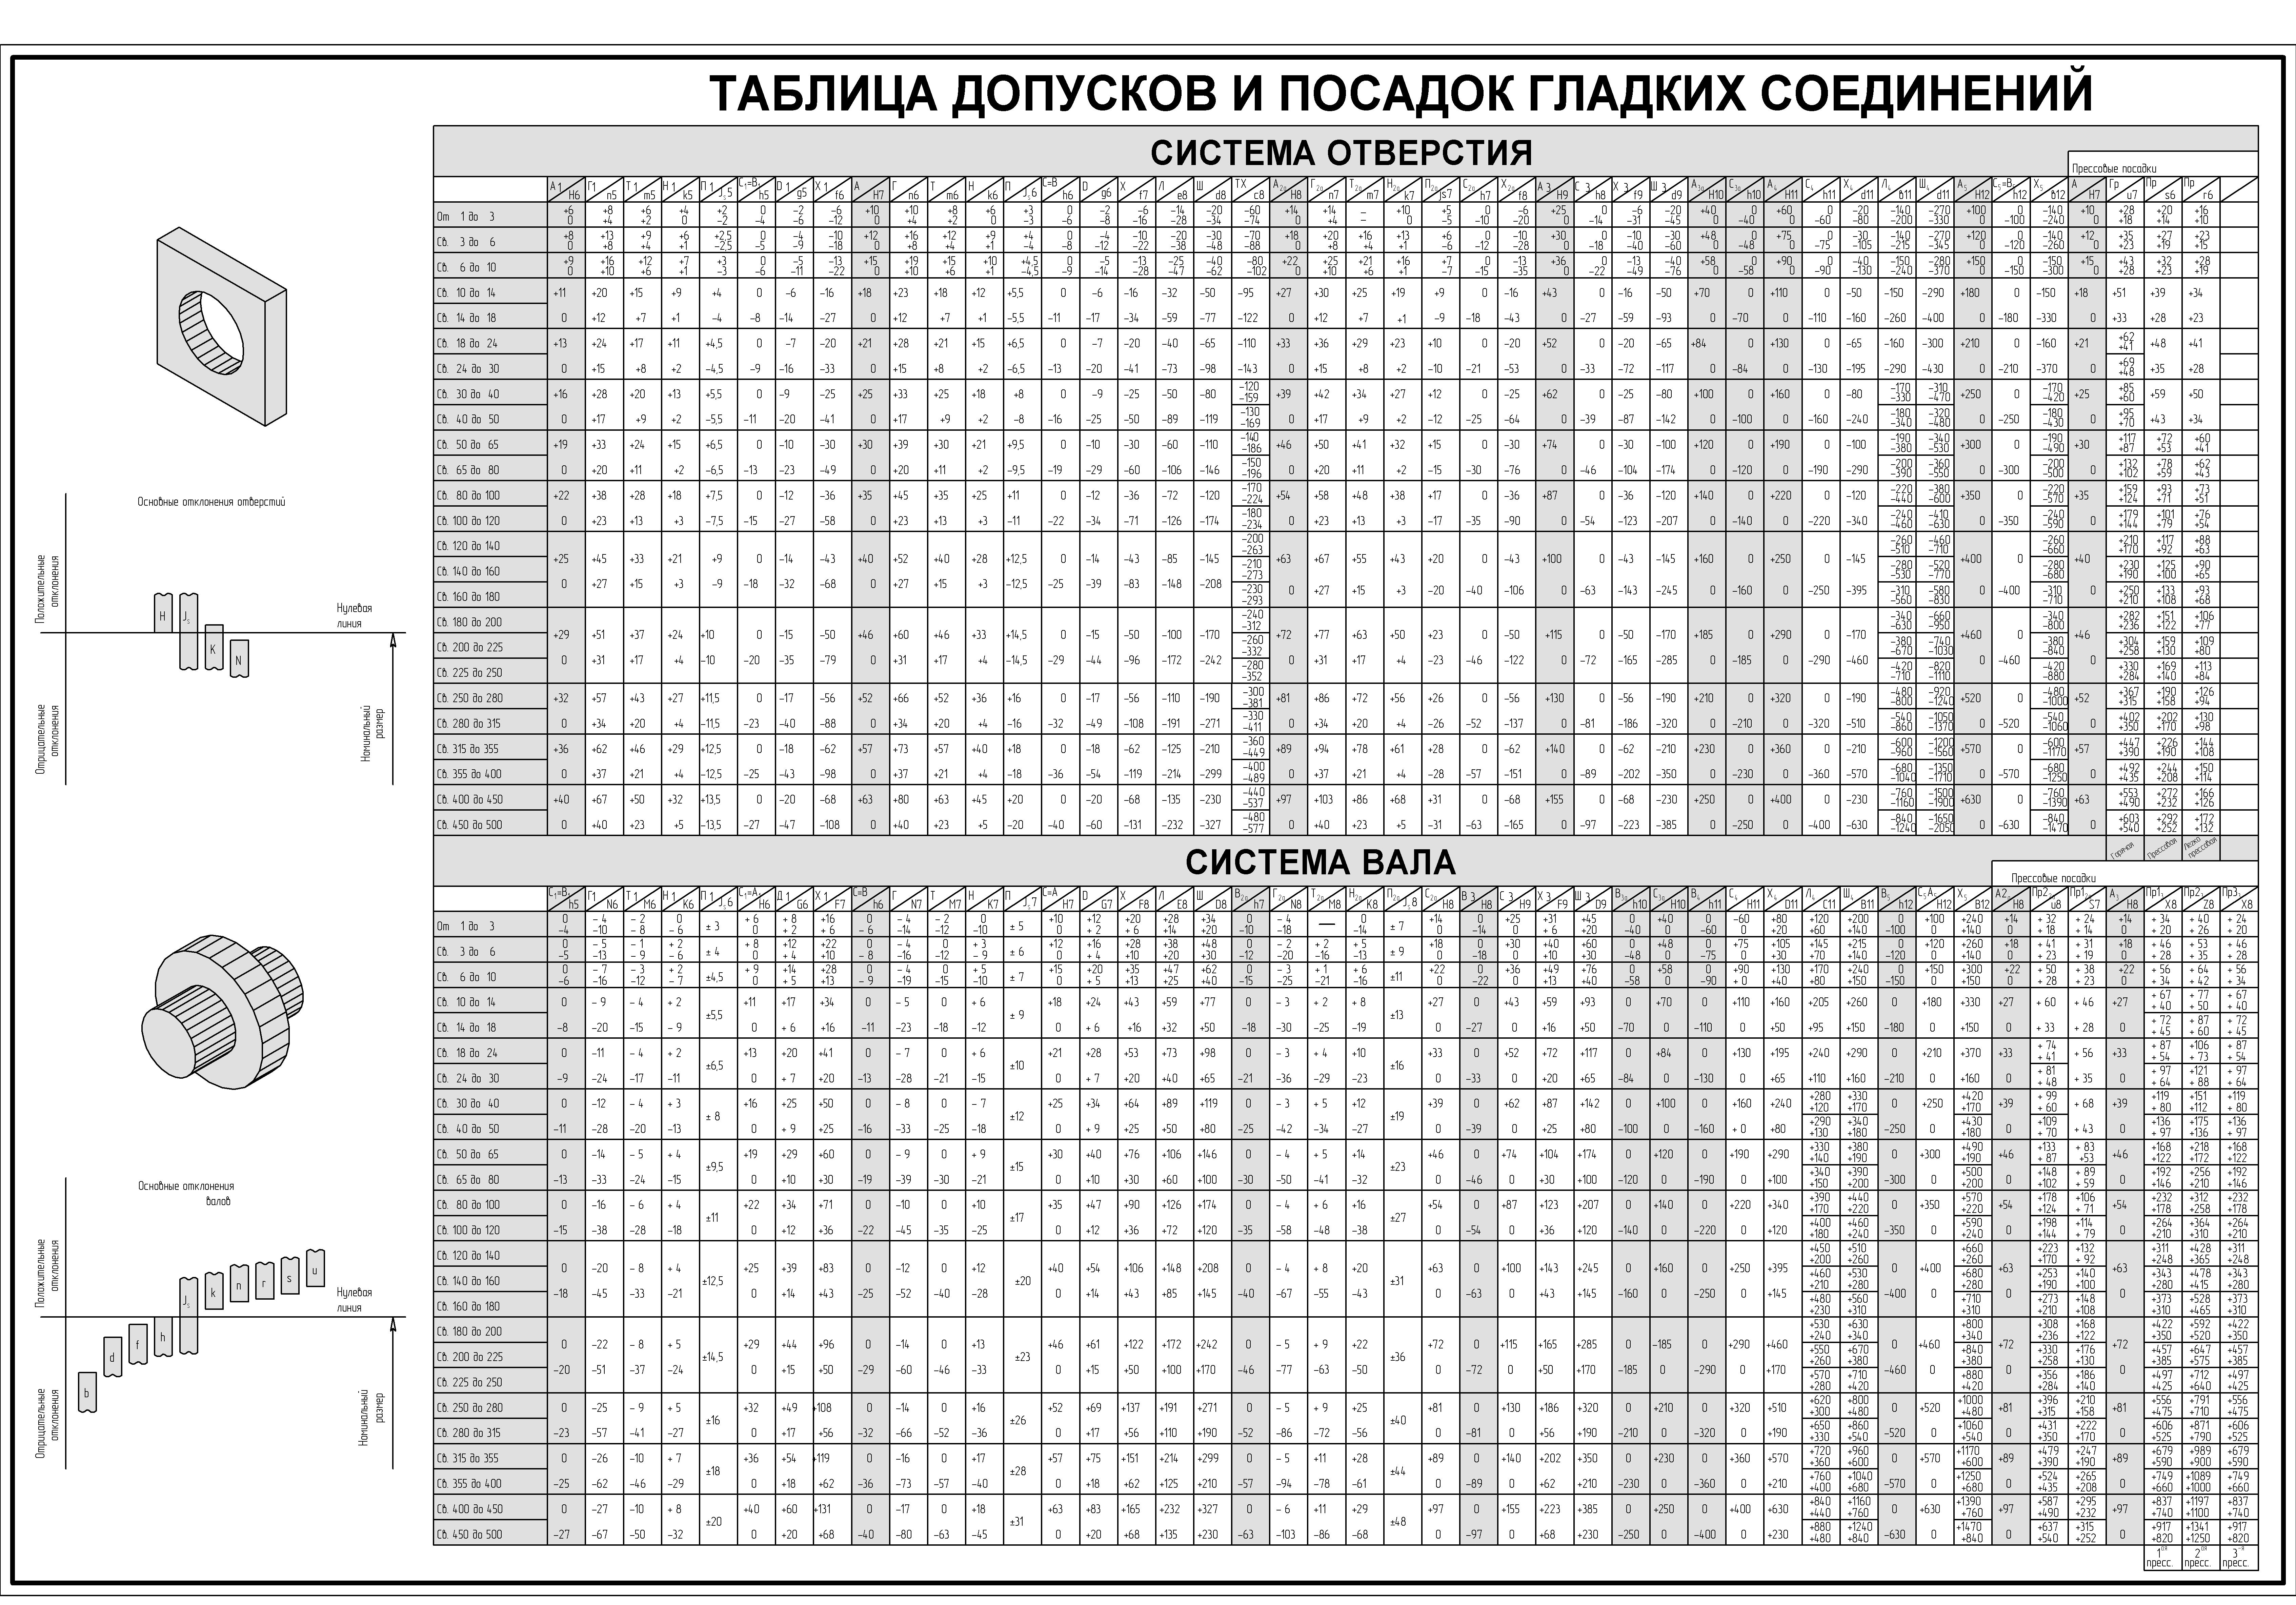 посадок системе допусков вала таблица